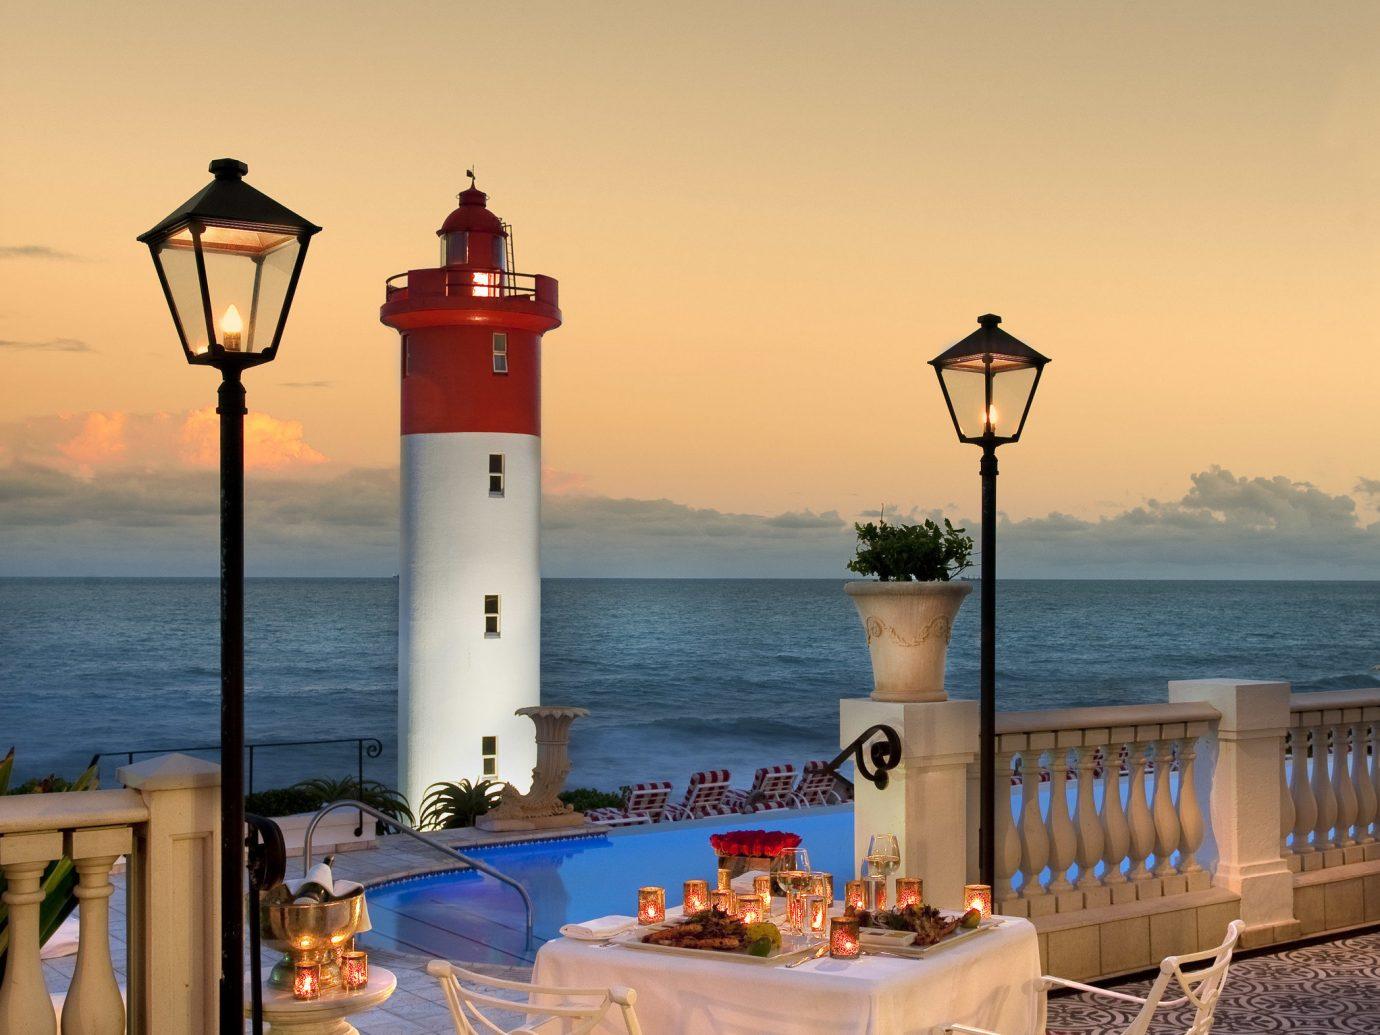 Hotels water sky Beach Sea vacation Ocean Sunset morning evening Coast dusk